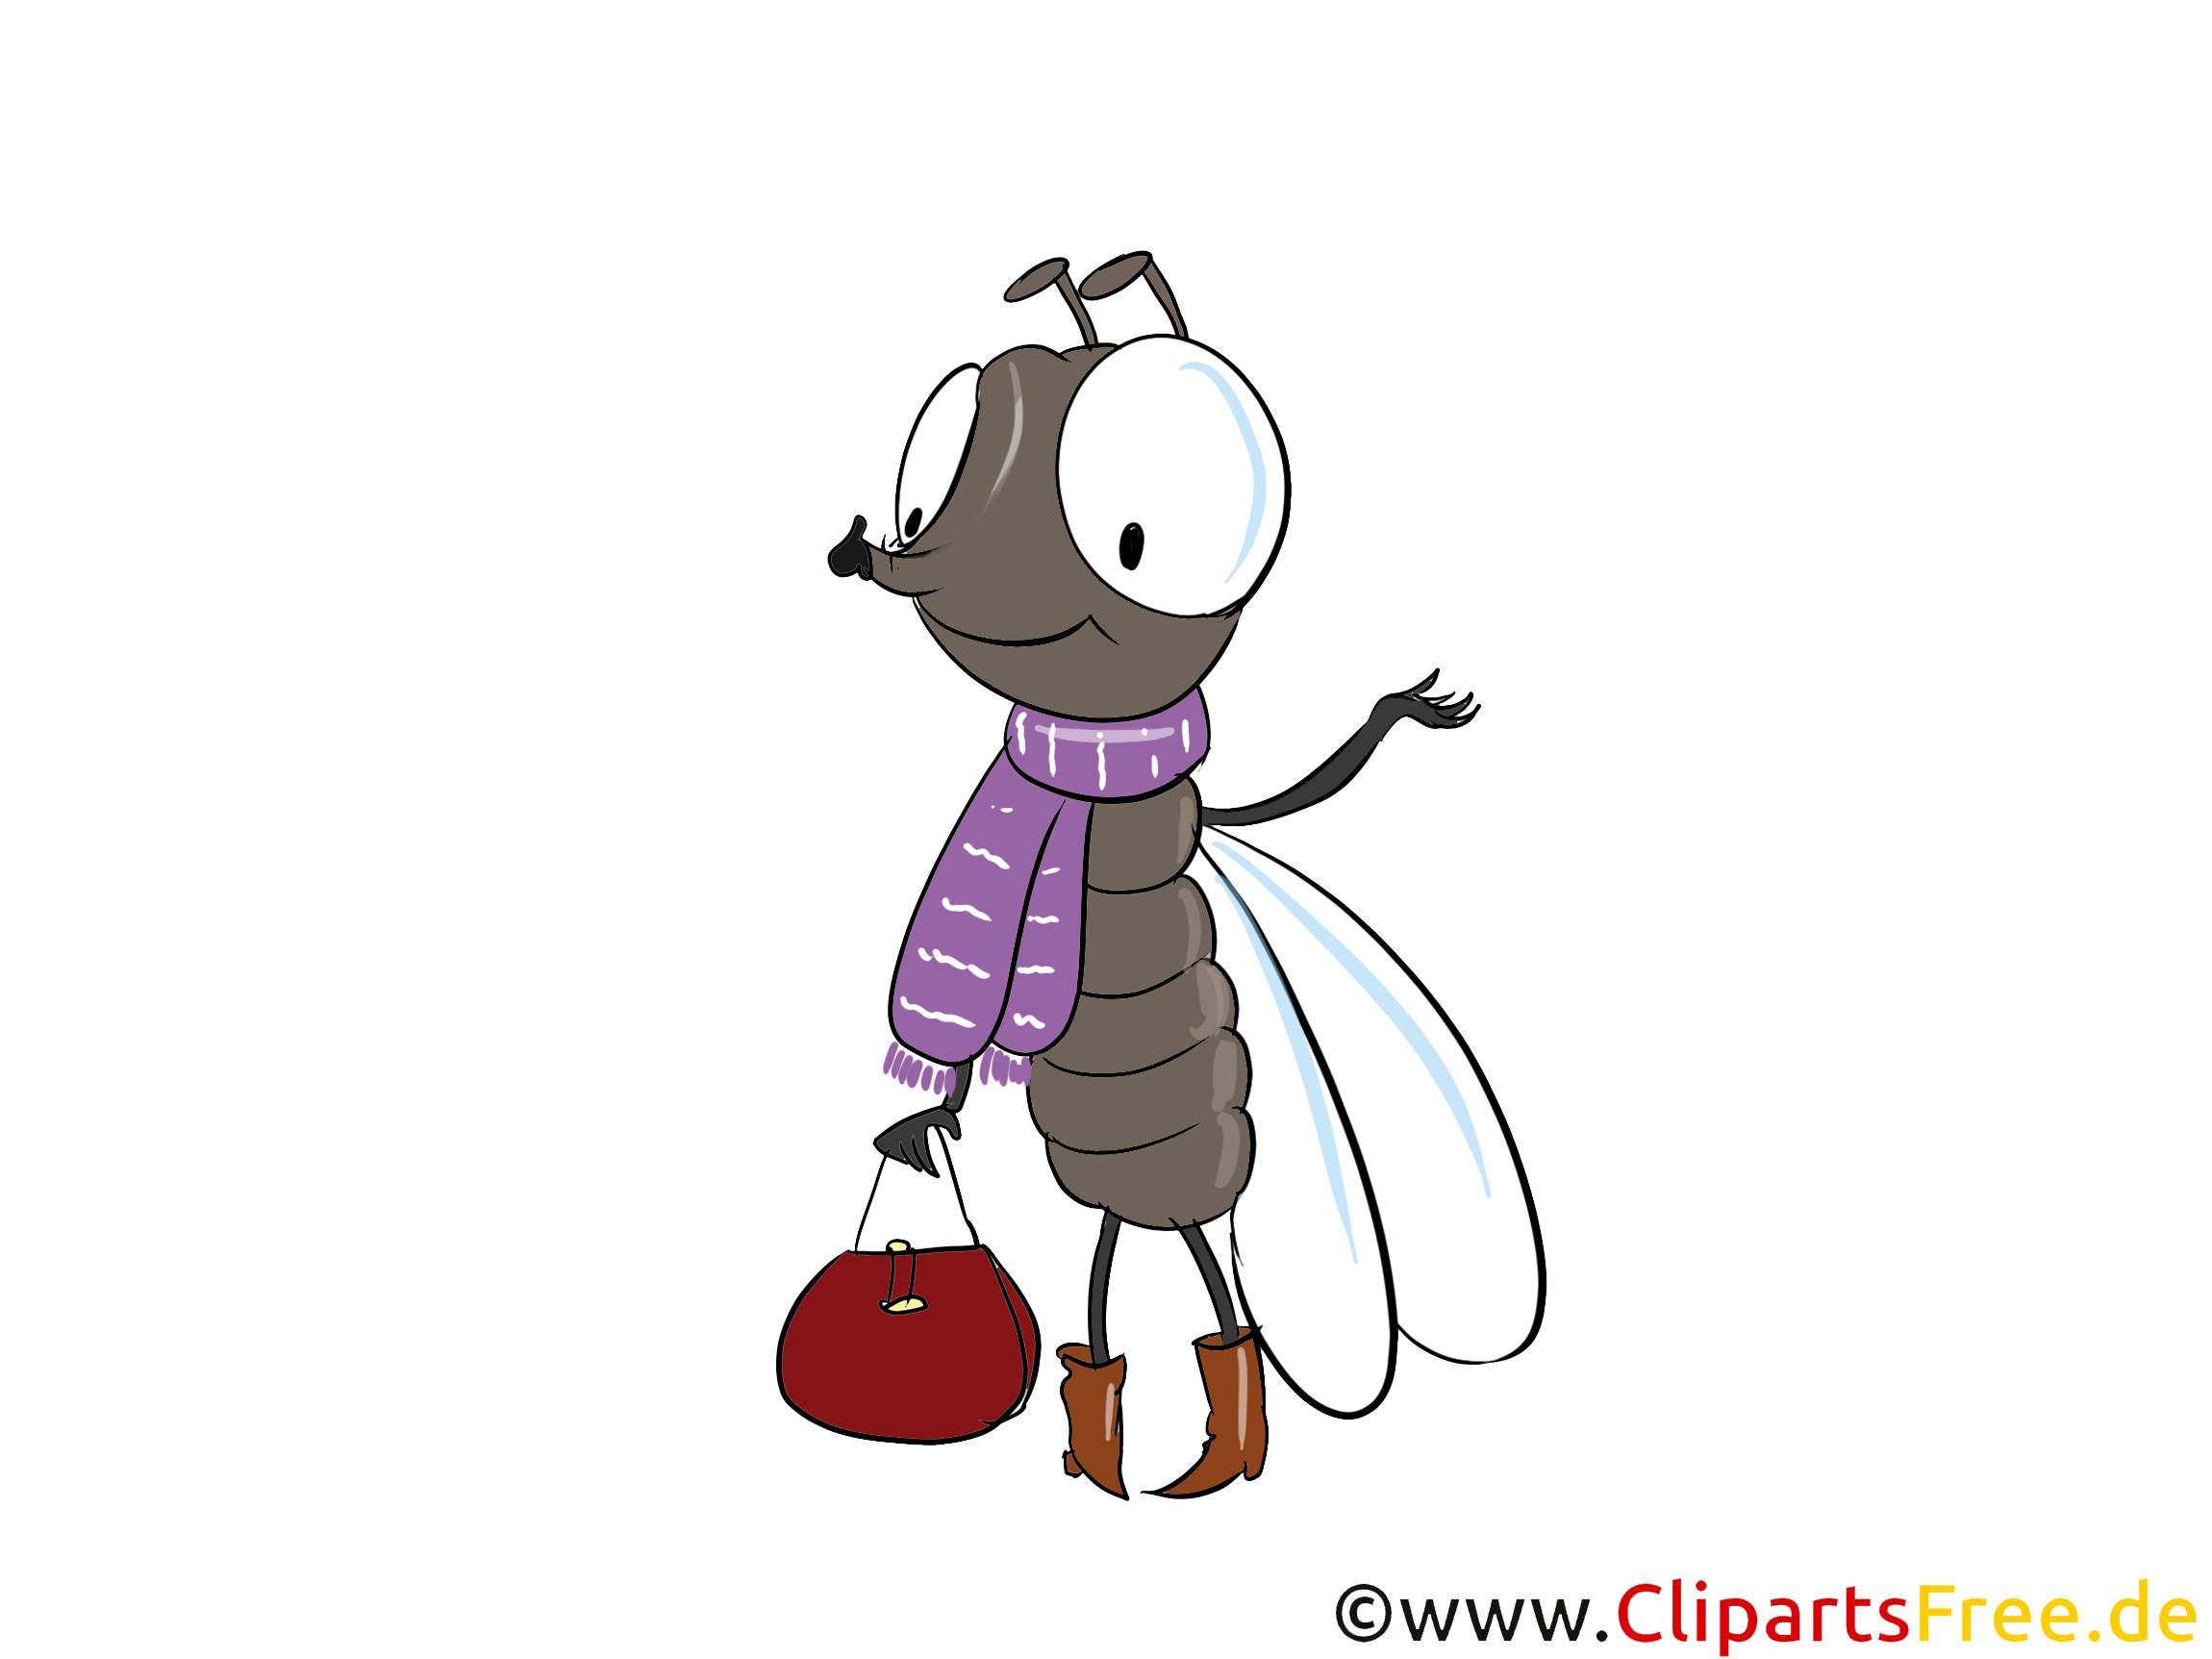 Mücke, Fliege Cartoon Bild, Clipart, Illustration